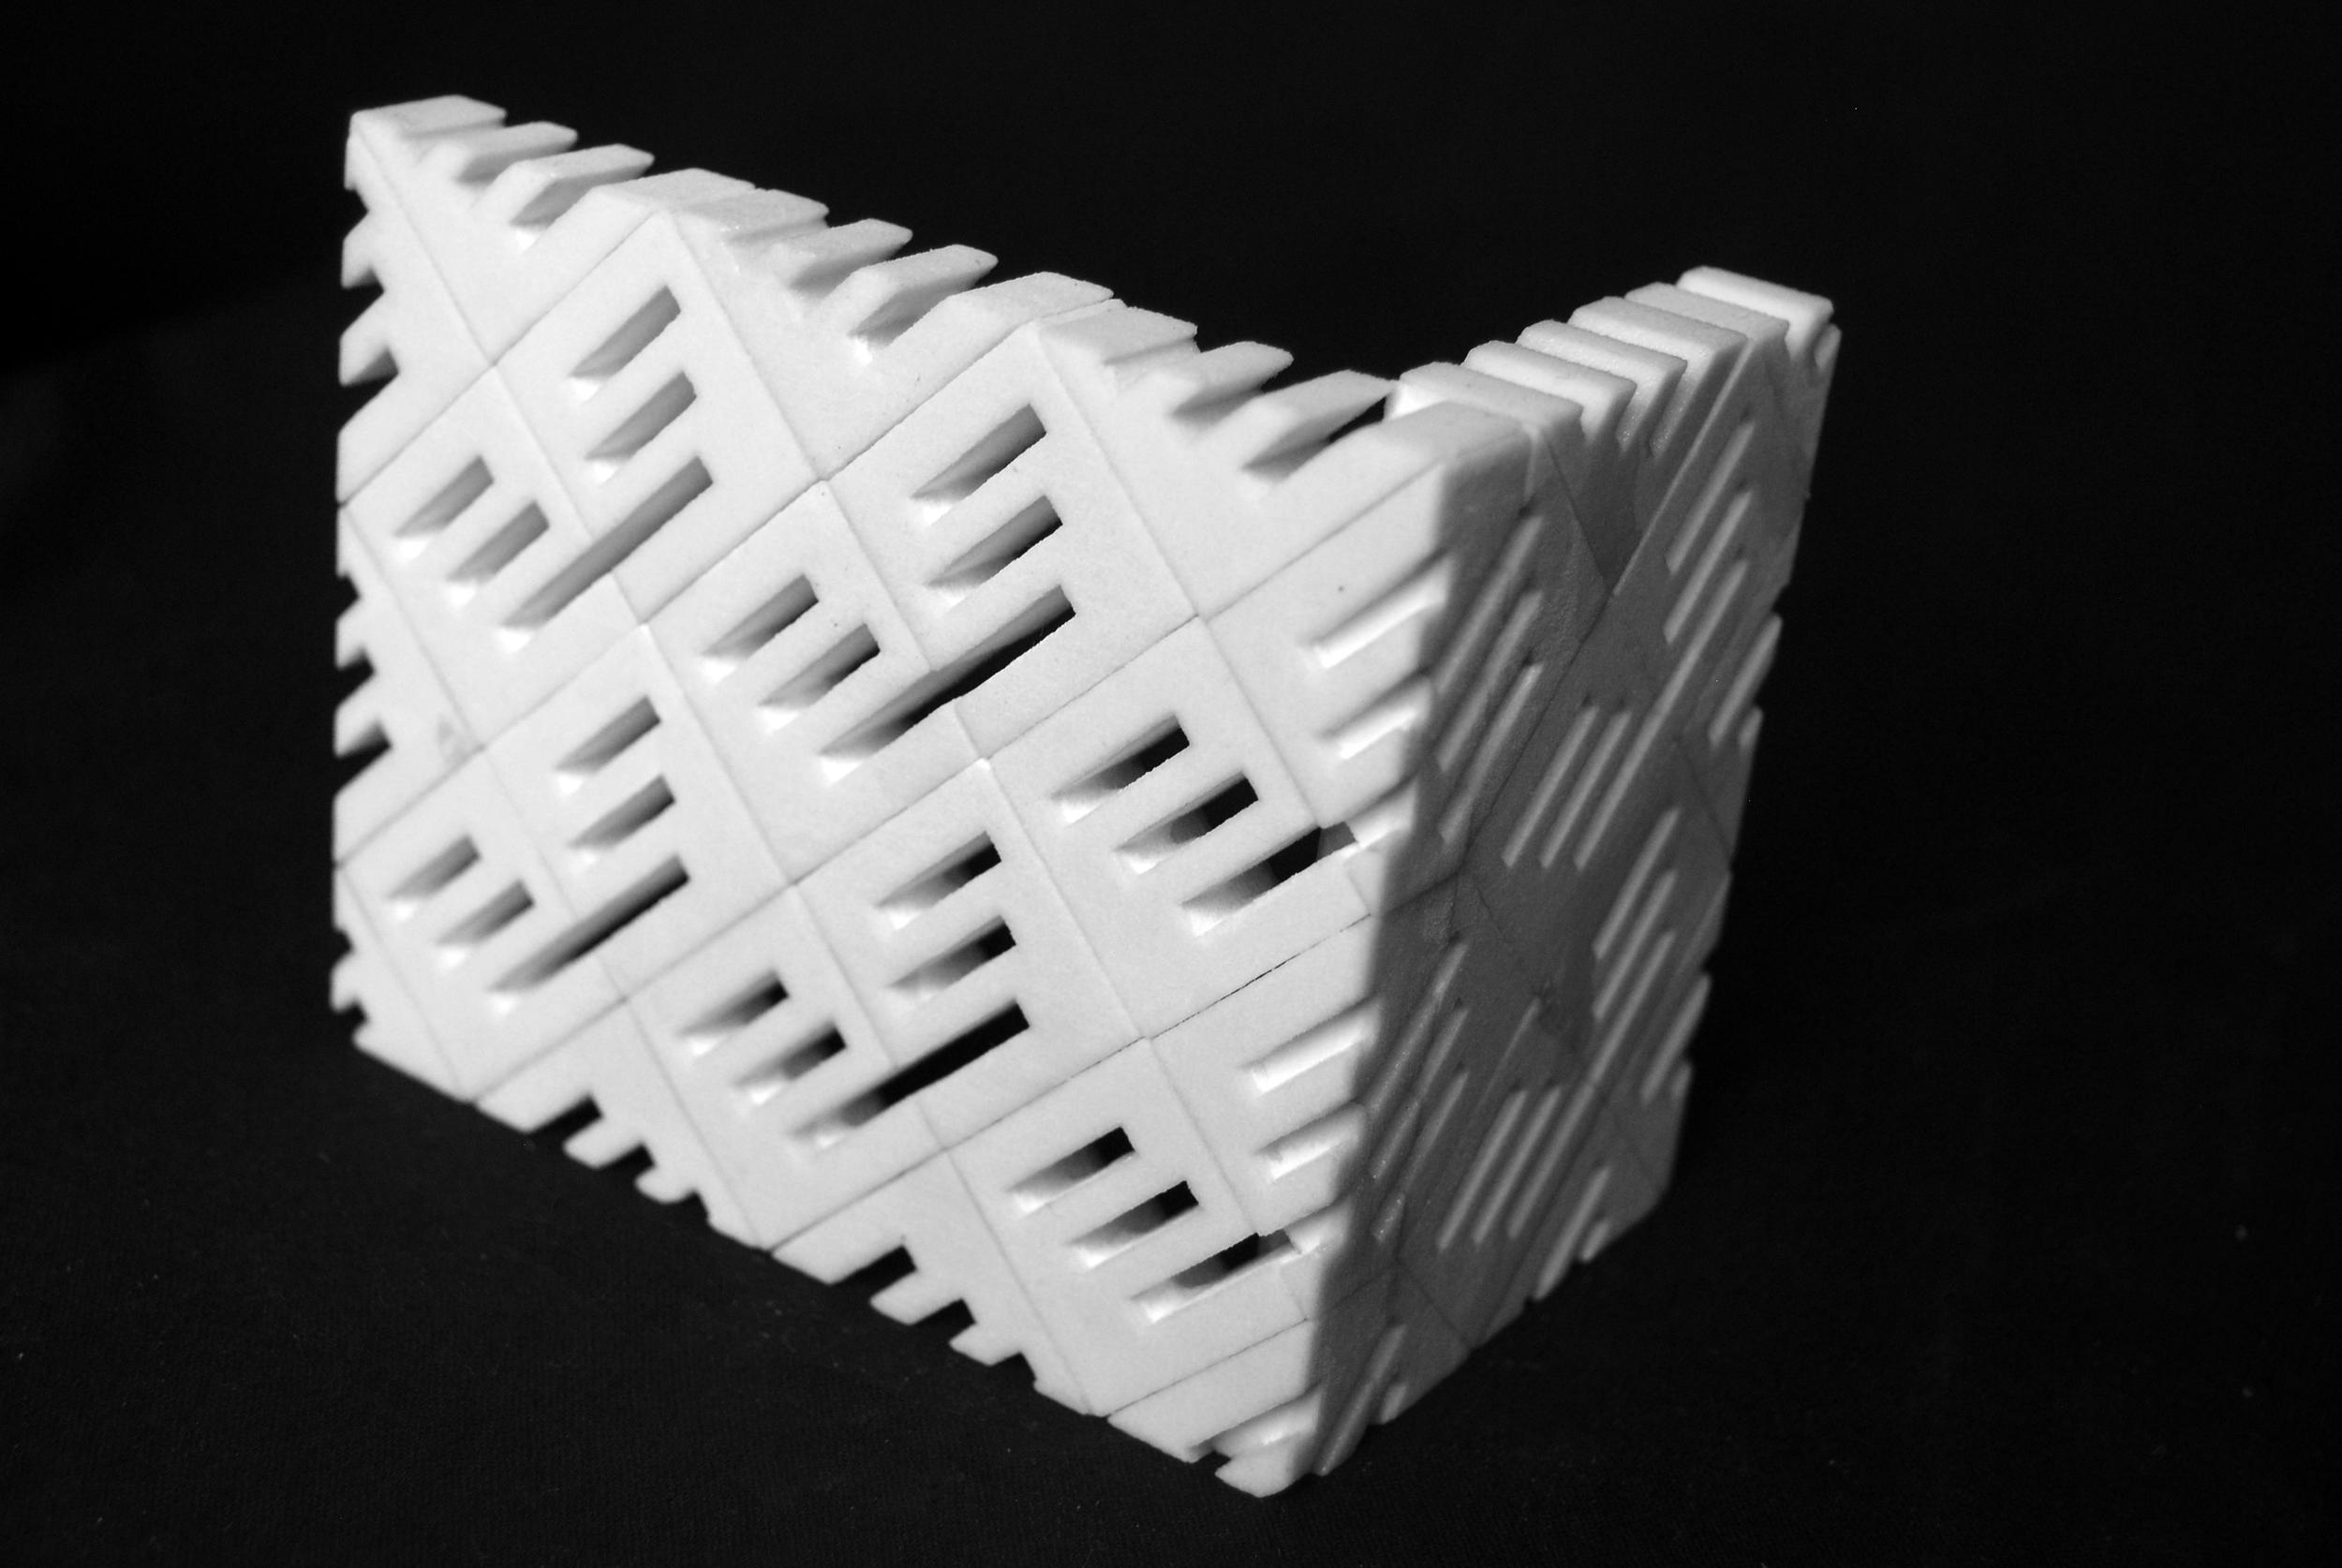 CUSTOM CMU BLOCK DESIGN - 3D PRINTED